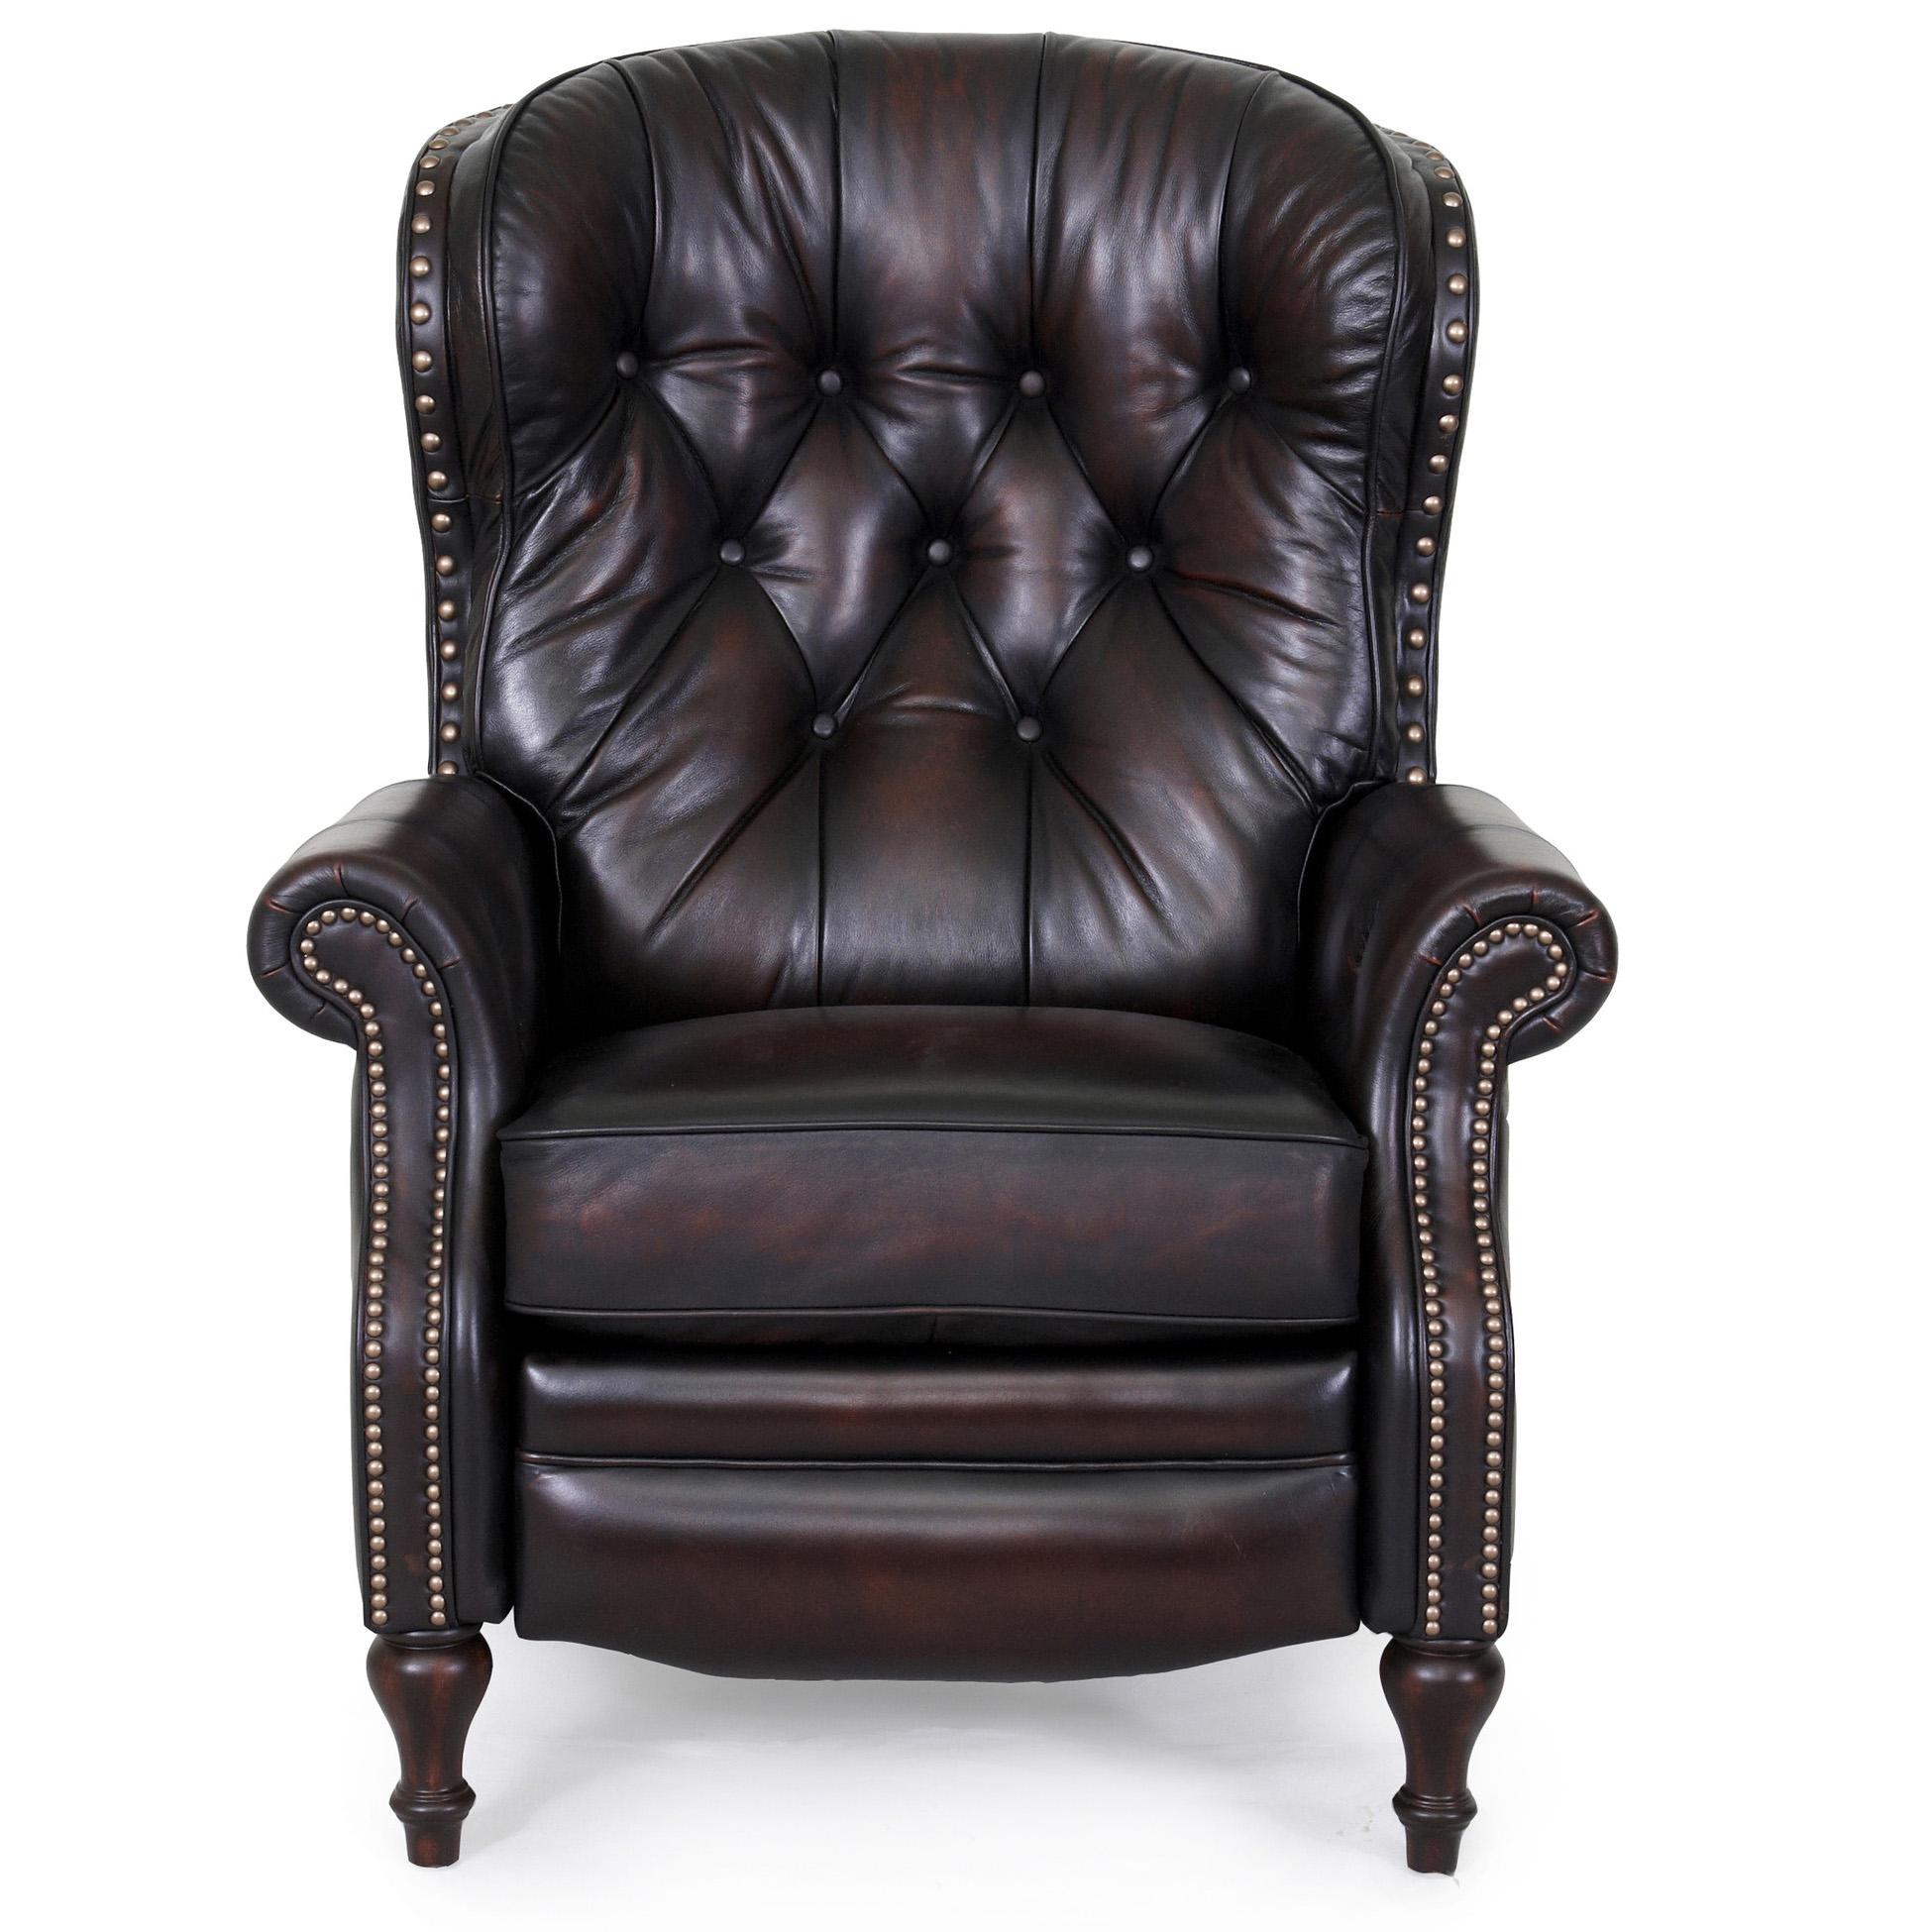 Barcalounger Kendall Ii Recliner Chair Leather Recliner Chair